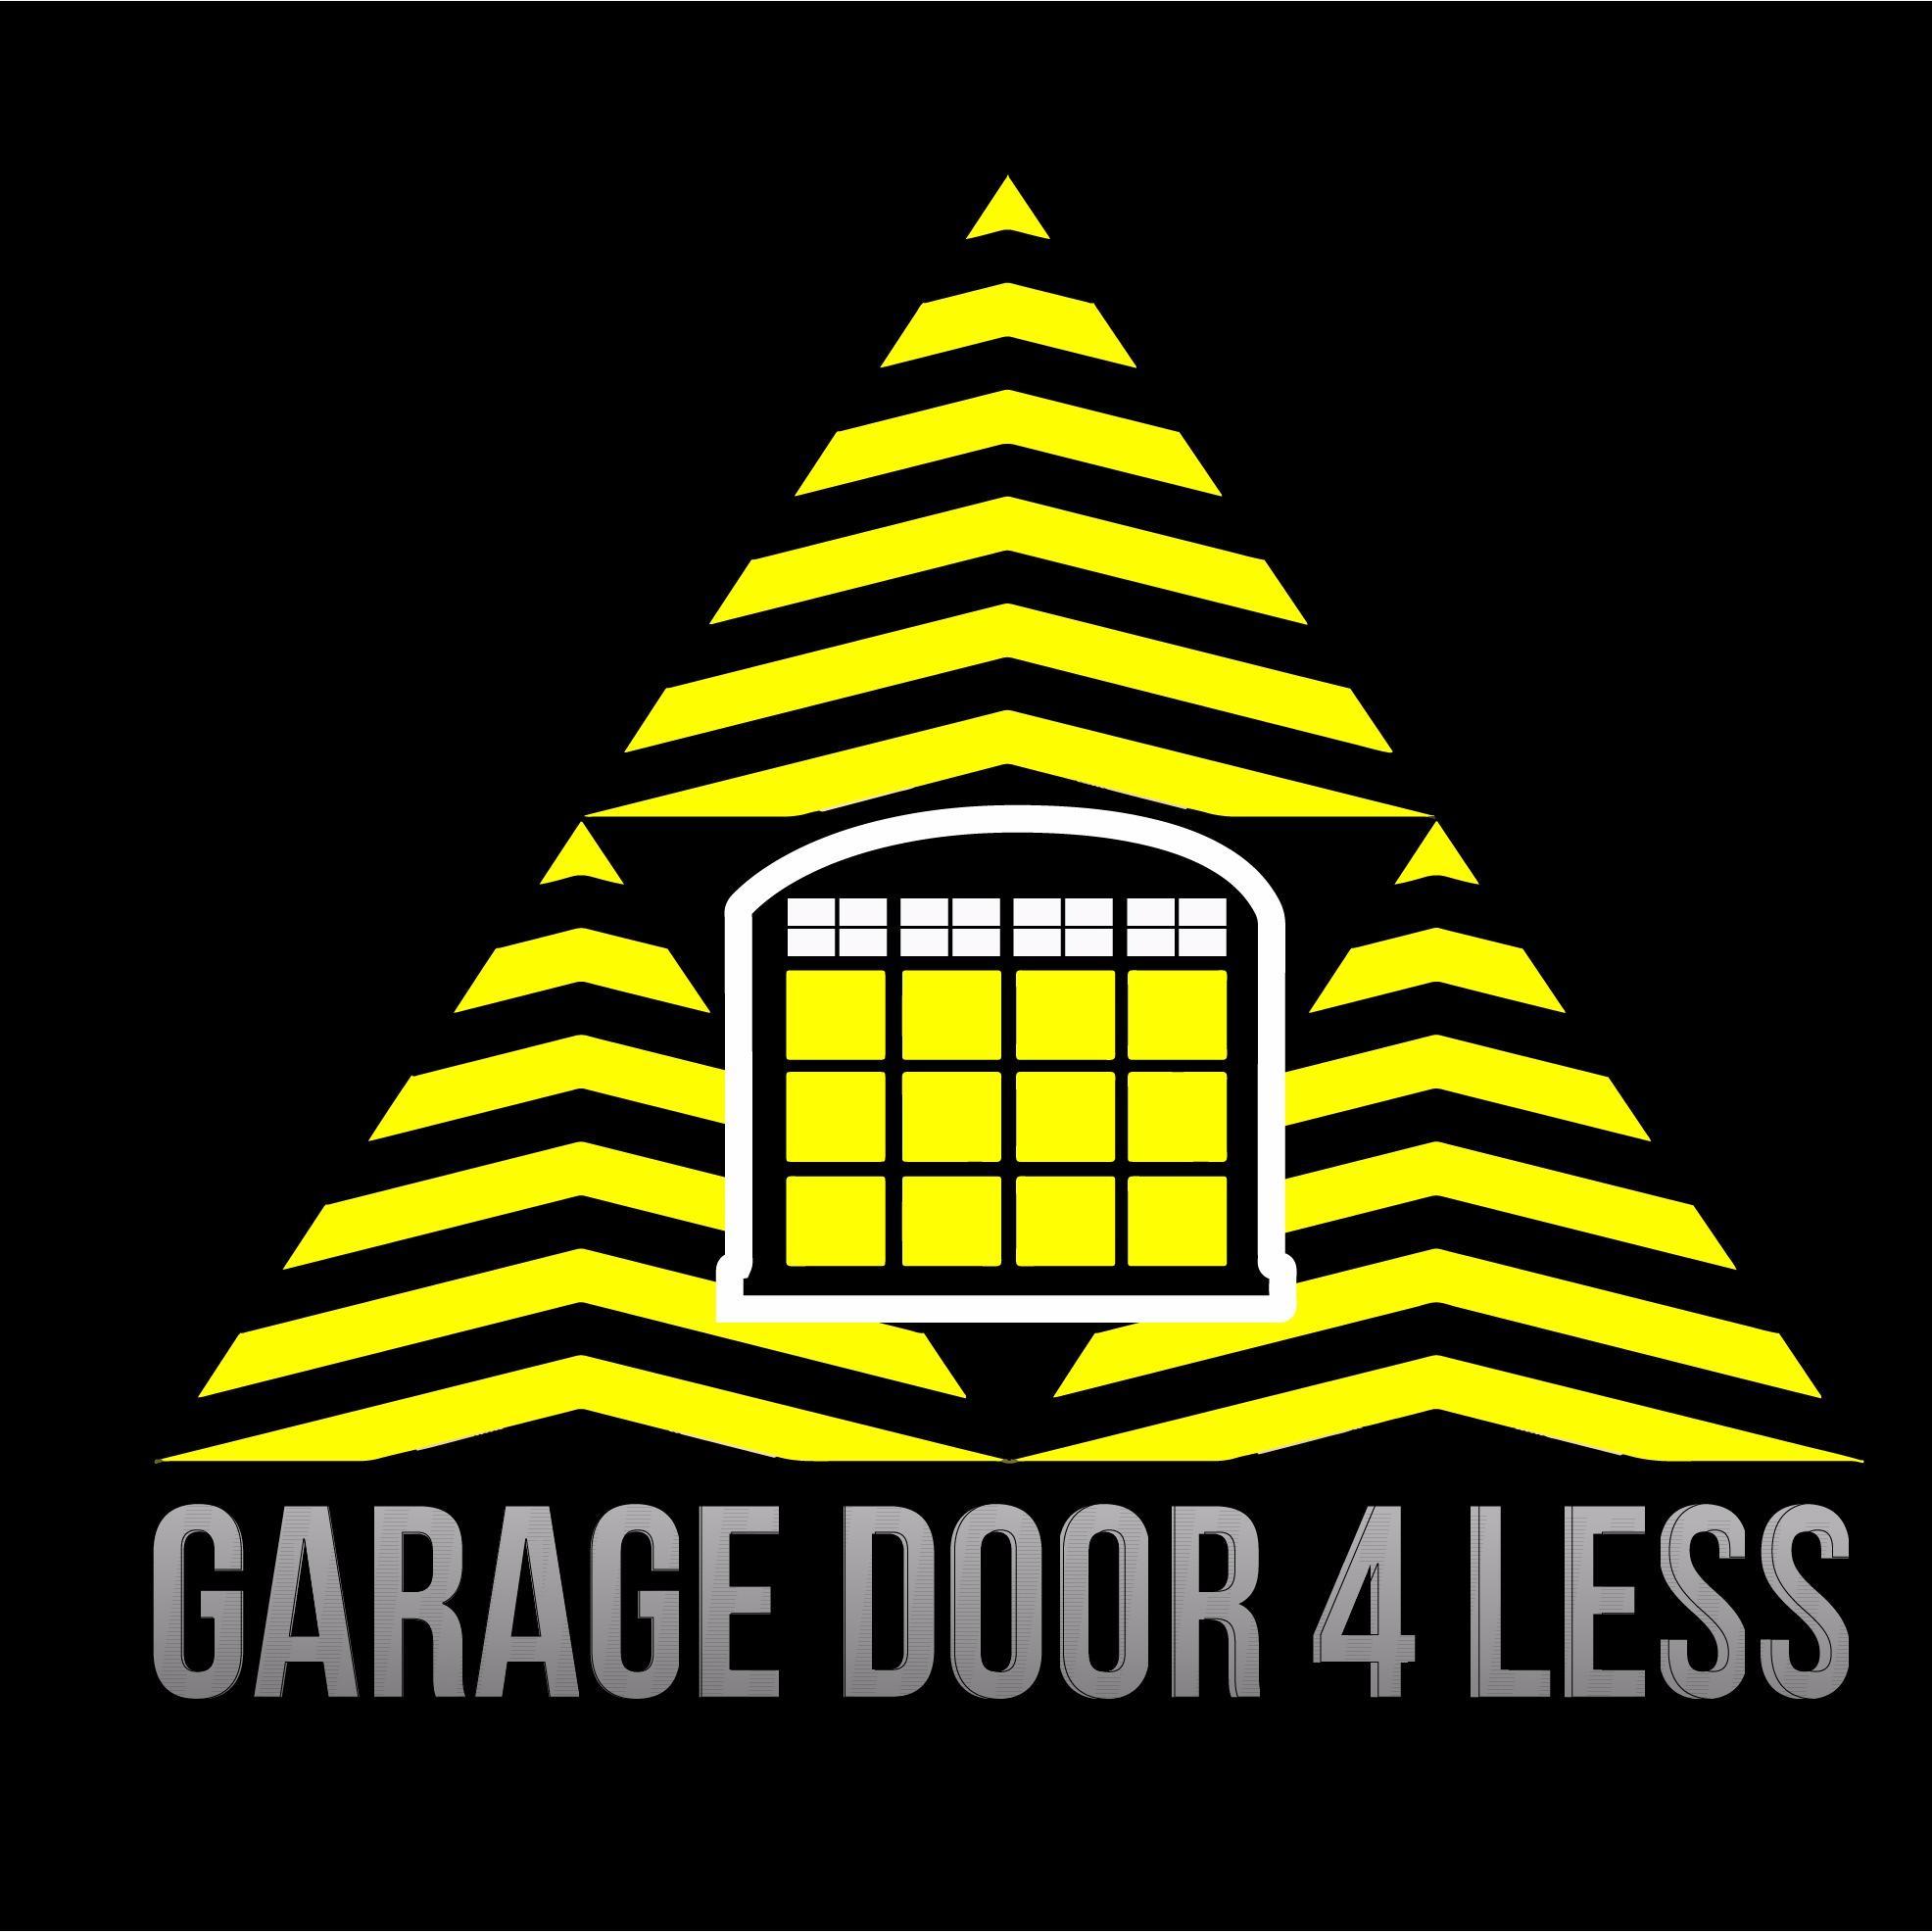 Garage Door 4 Less Garage Door 4 Less Garage Door 4